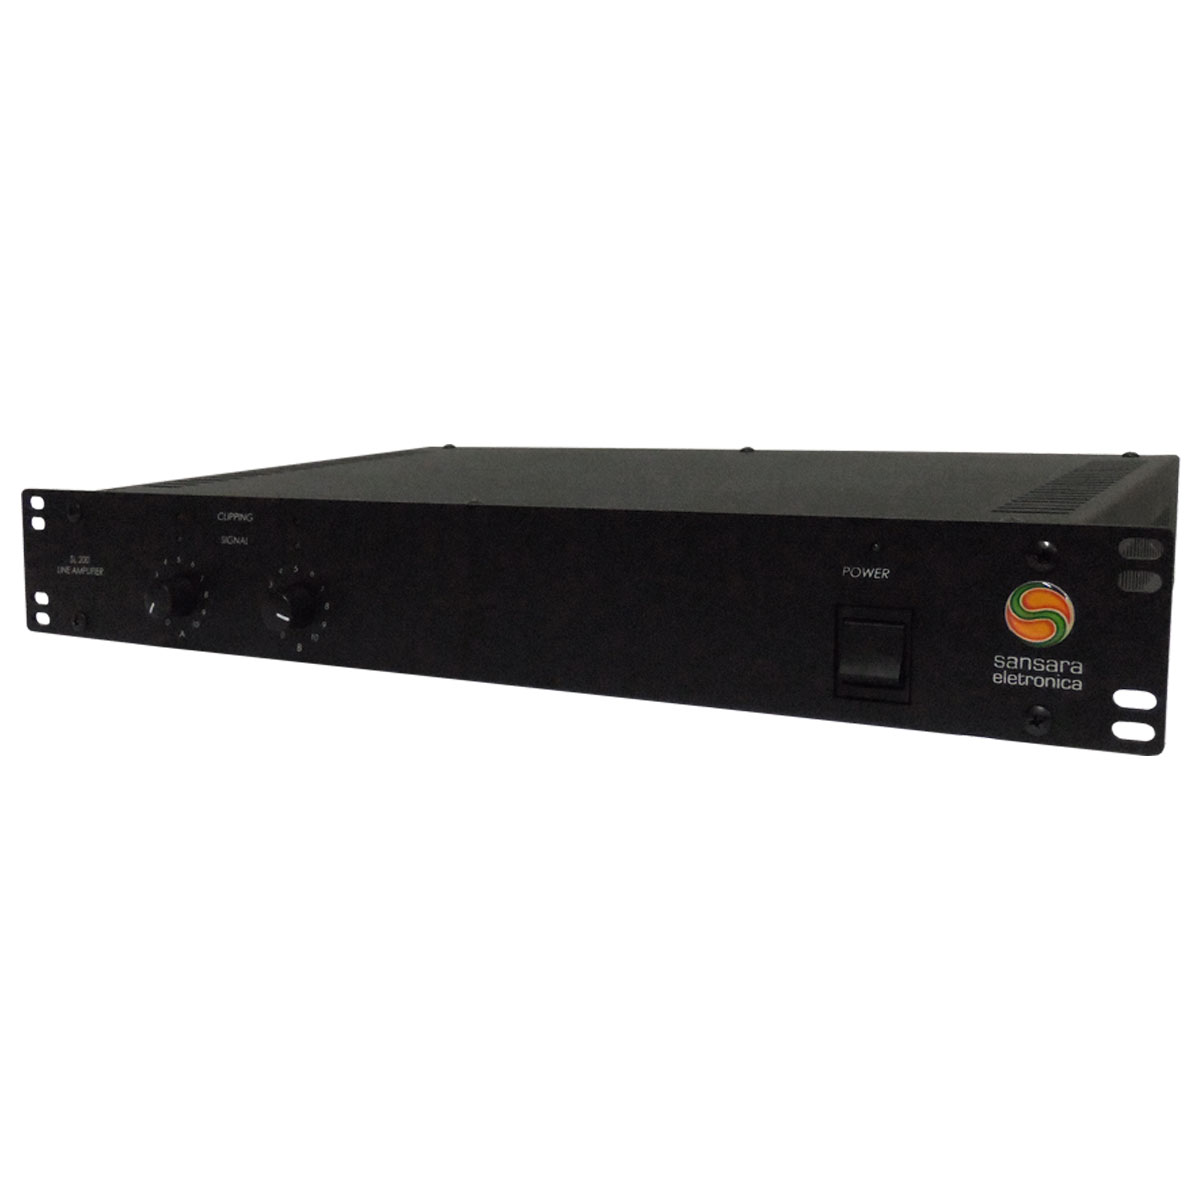 SL200 - Amplificador de Linha Mono / Estéreo 200W SL 200 - Sansara